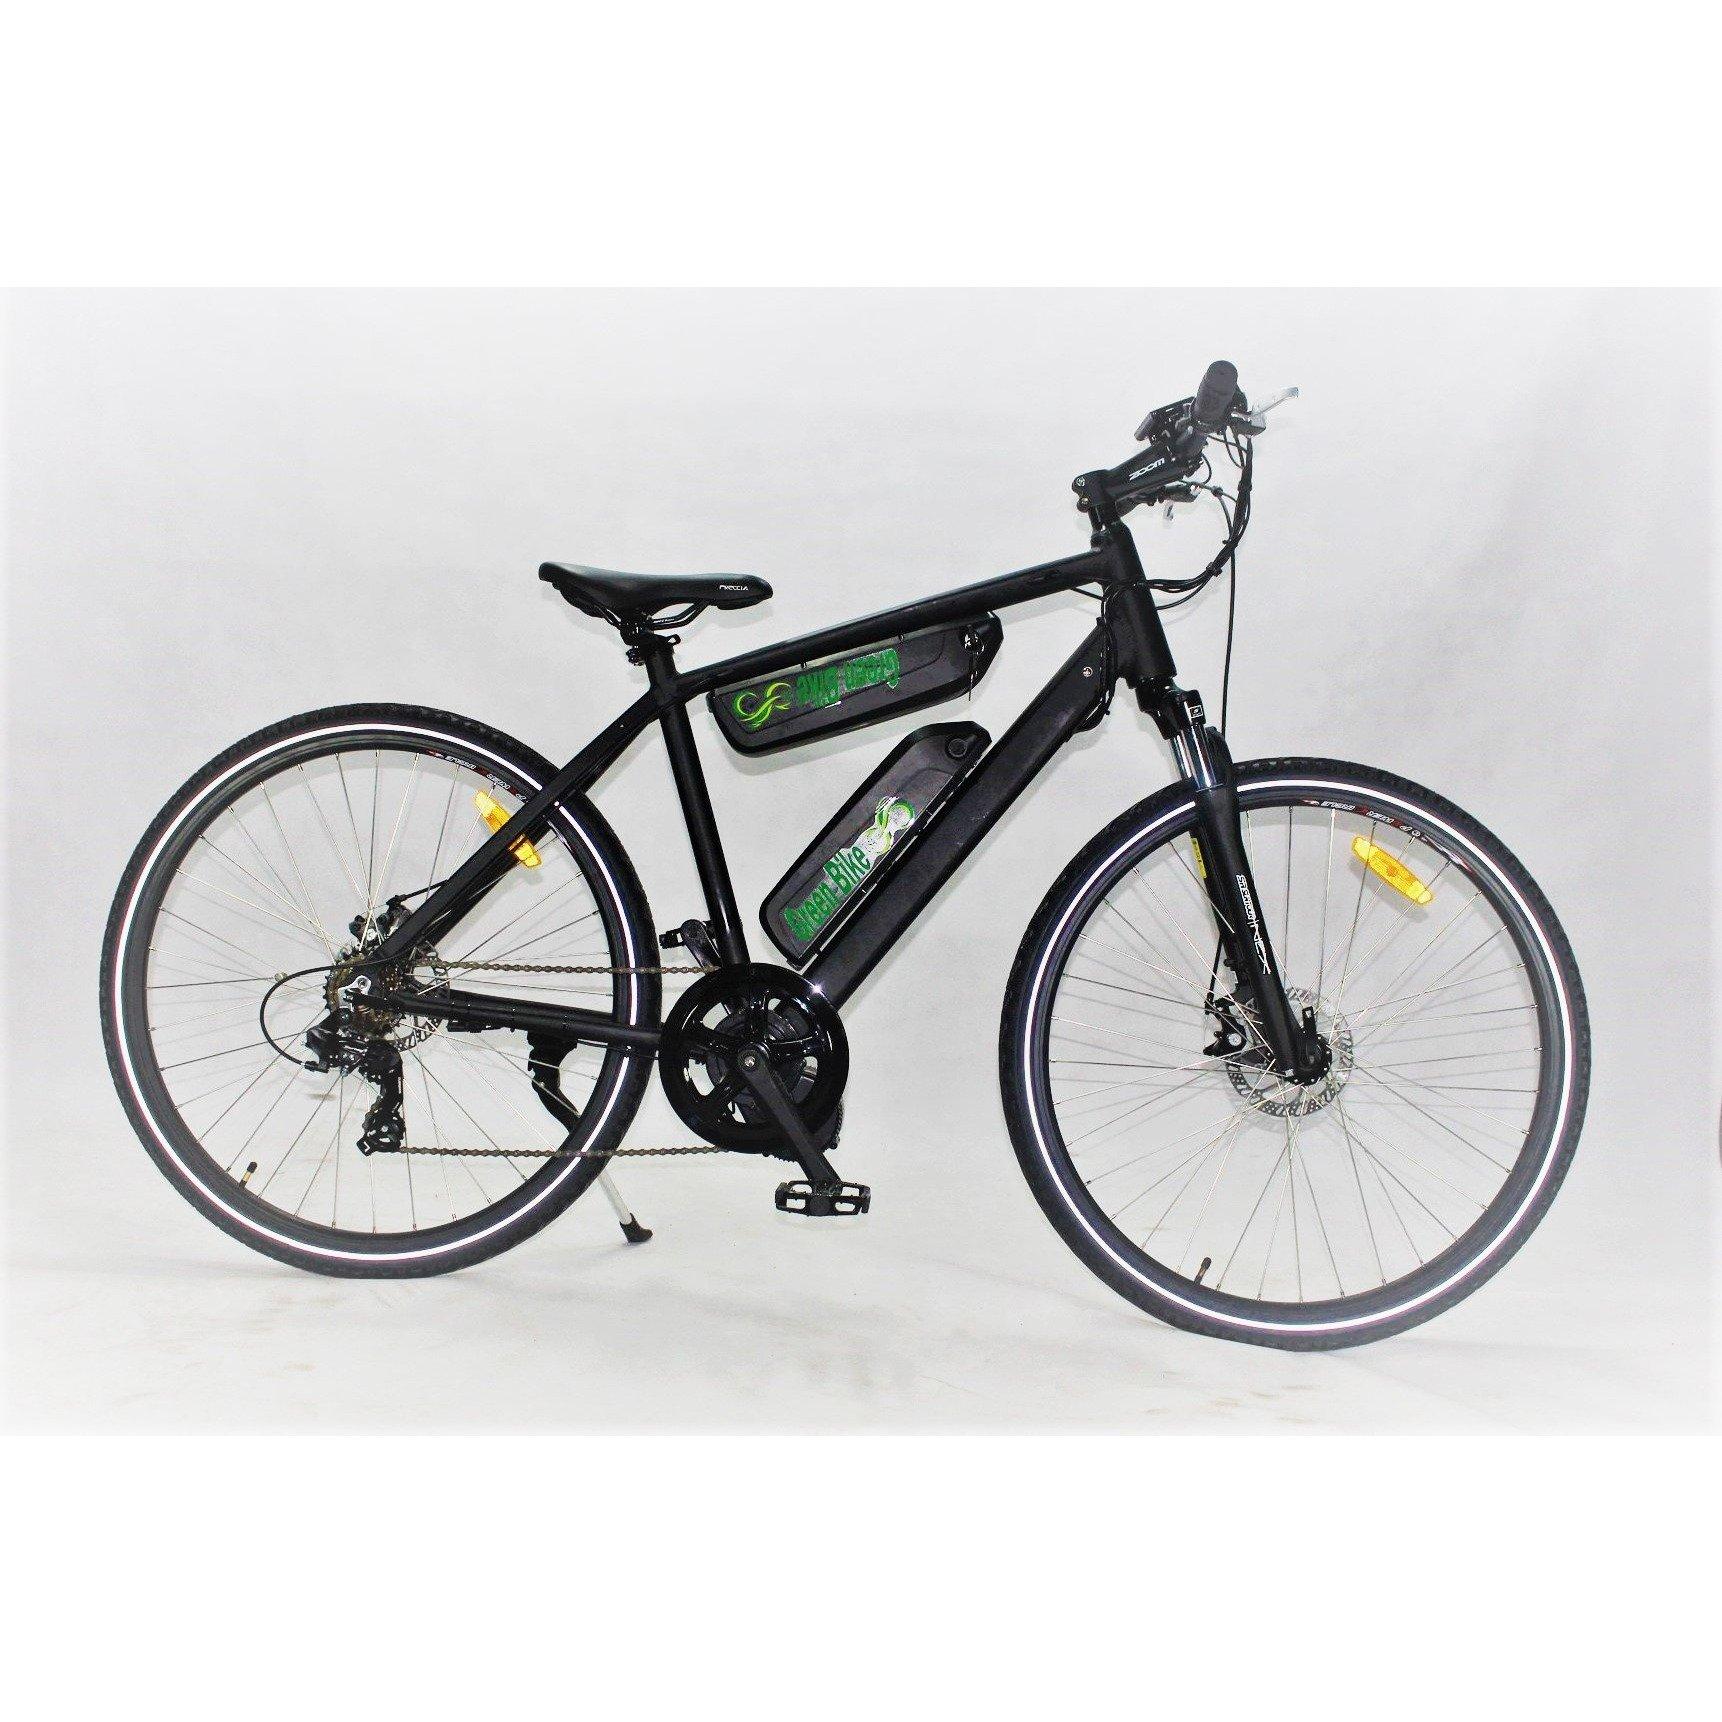 Green Bike Usa Gb Infinity Electric Commuter Bike Commuter